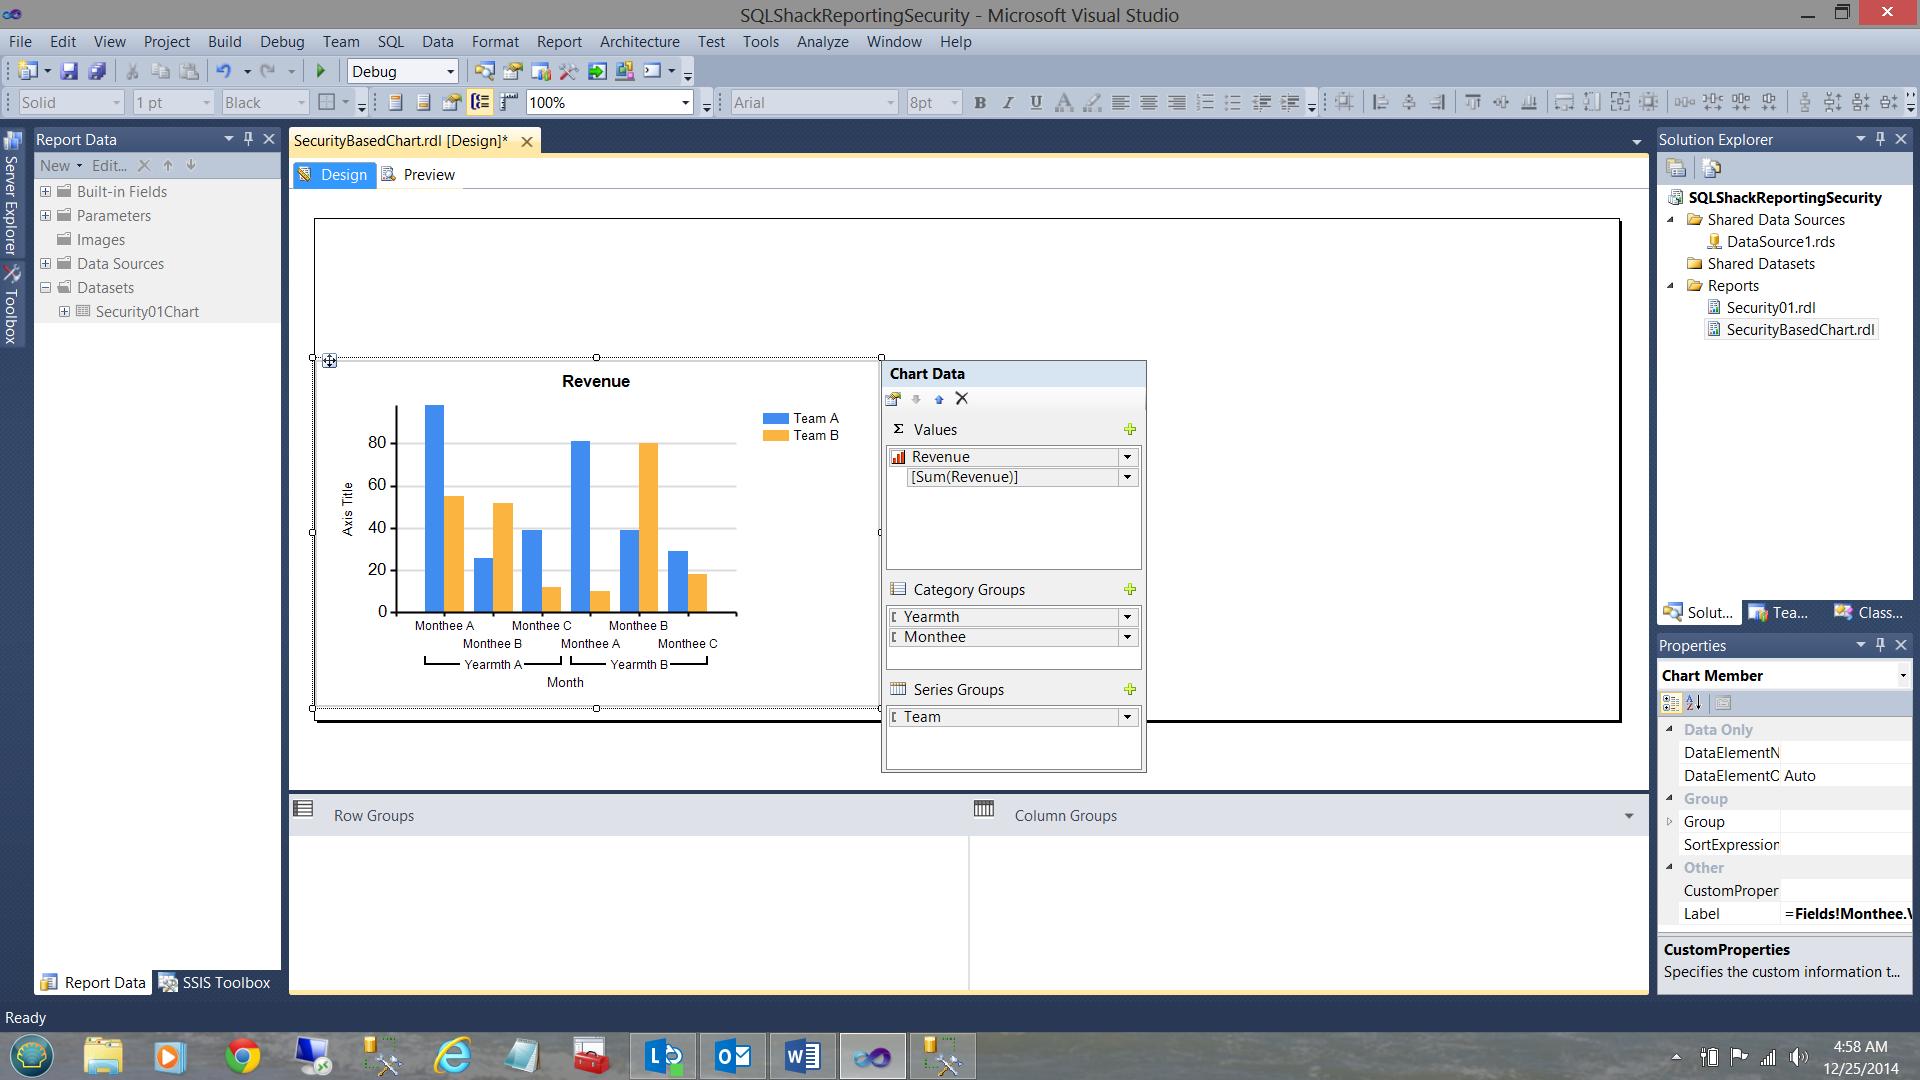 SQL Server安全机制–如何控制用户能够在报告中查看哪些数据23